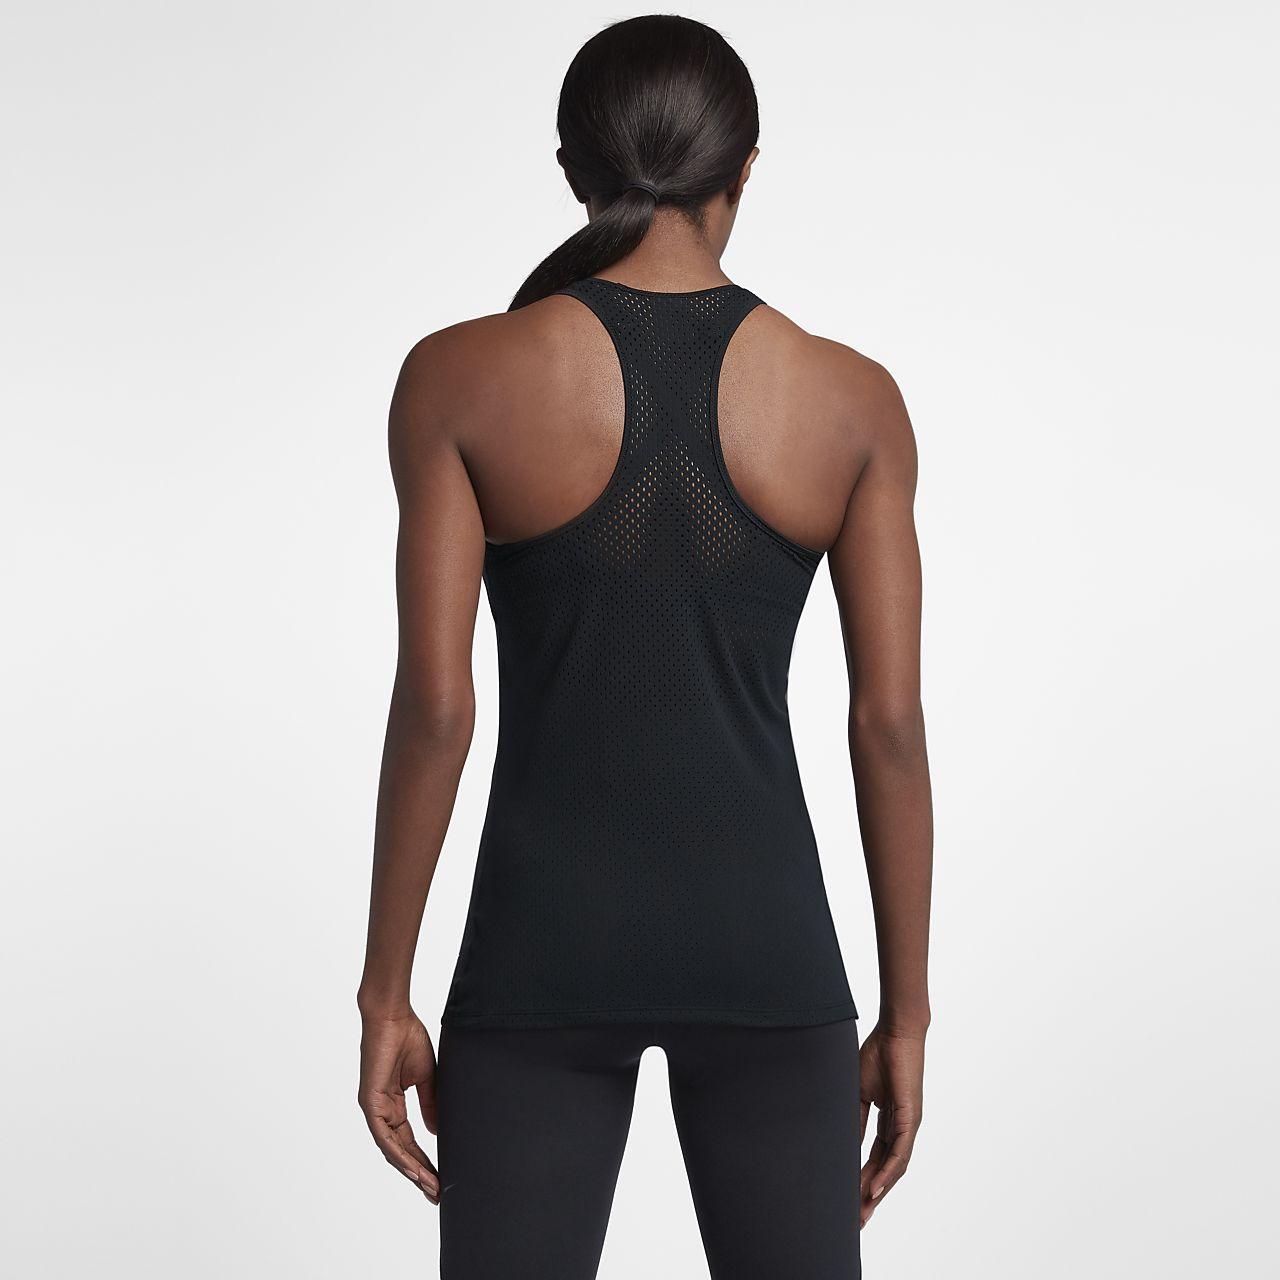 152f652c3e3d Γυναικείο φανελάκι προπόνησης Nike Pro HyperCool. Nike.com GR